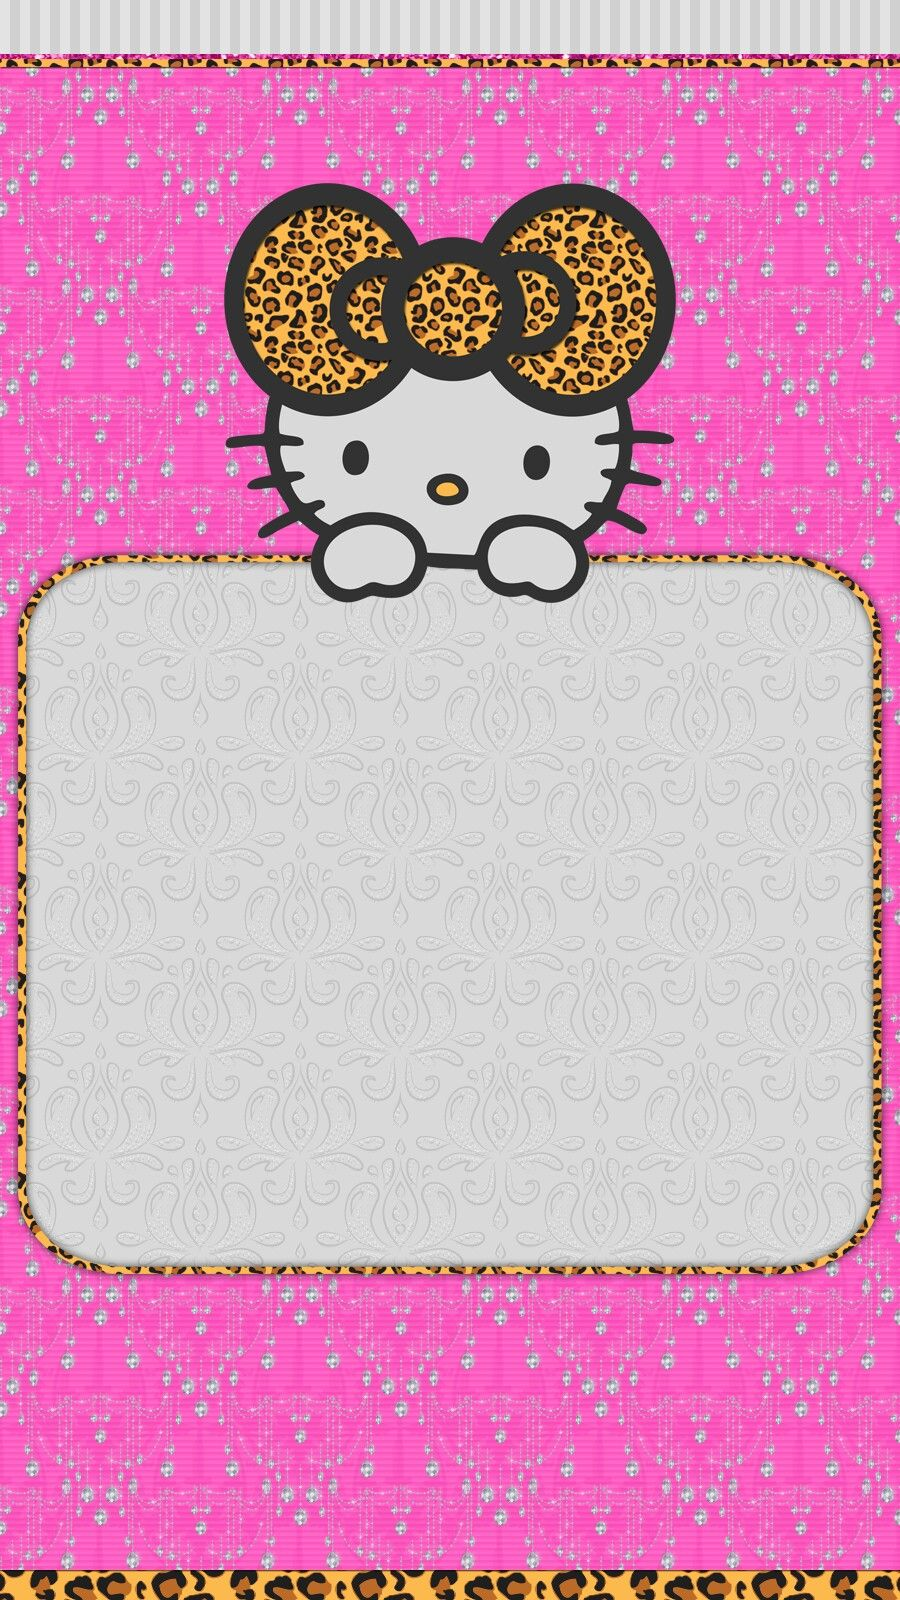 Cool Wallpaper Hello Kitty Diamond - dd10621b4e0bb47c115d399c7346a2c7  You Should Have_337935.jpg